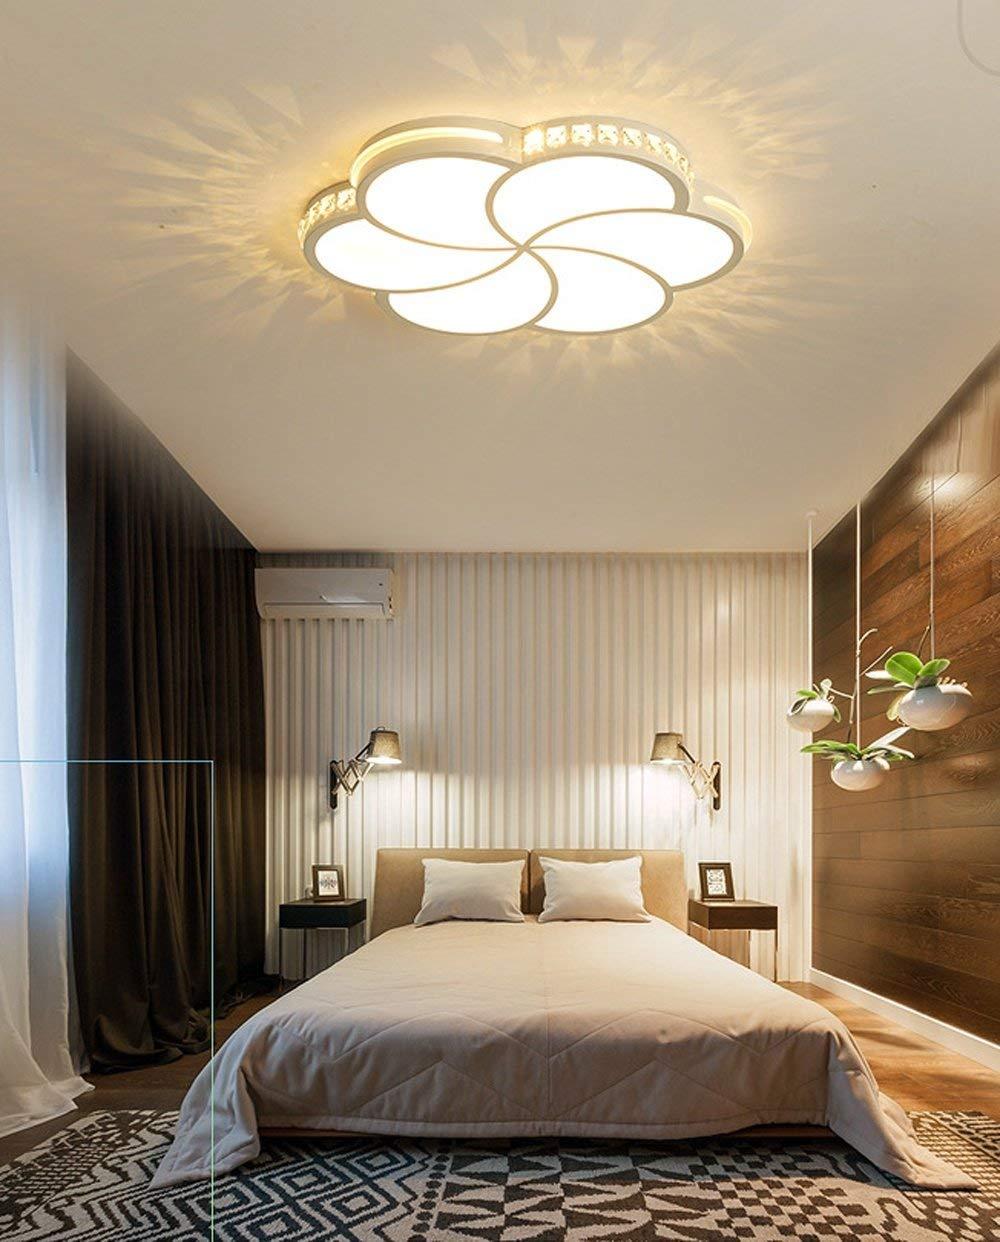 Amazoncom Afdk Led Ceiling Light Modern Simple Round